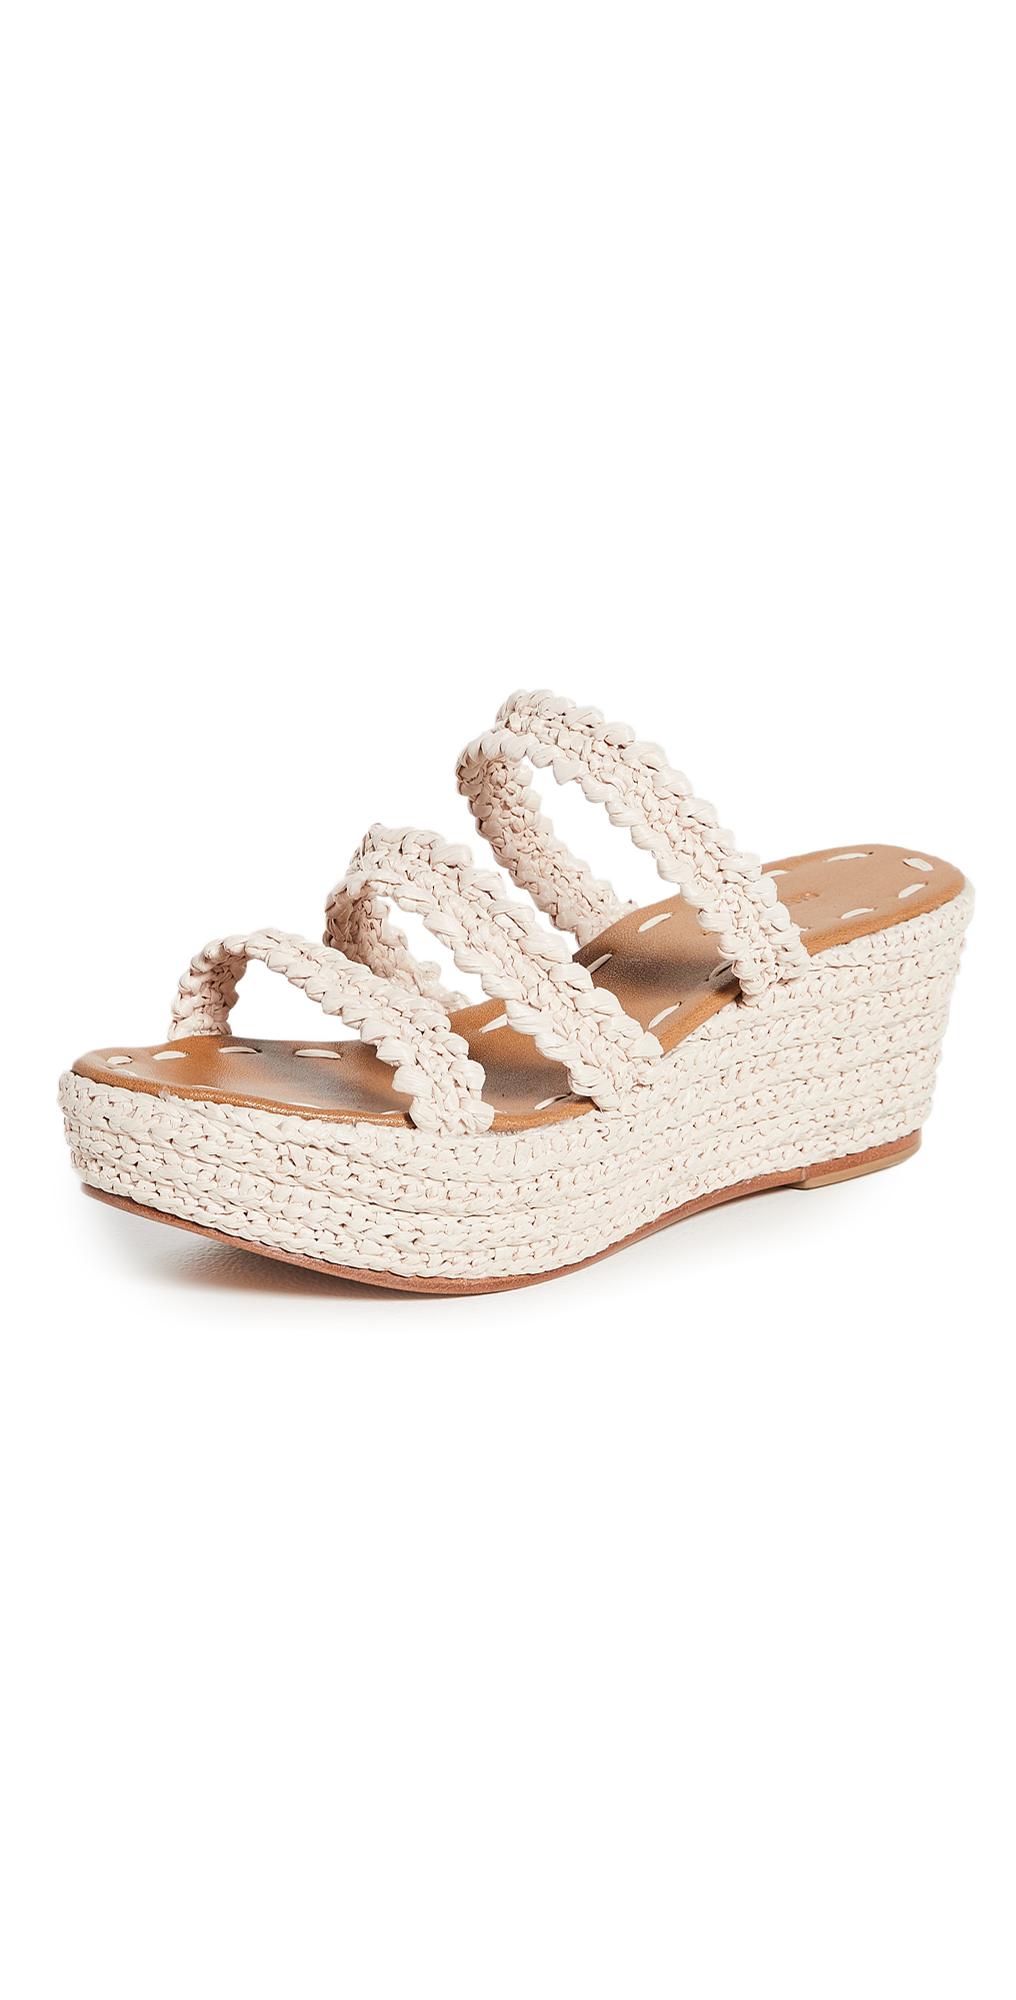 Said Platform Wedge Sandals